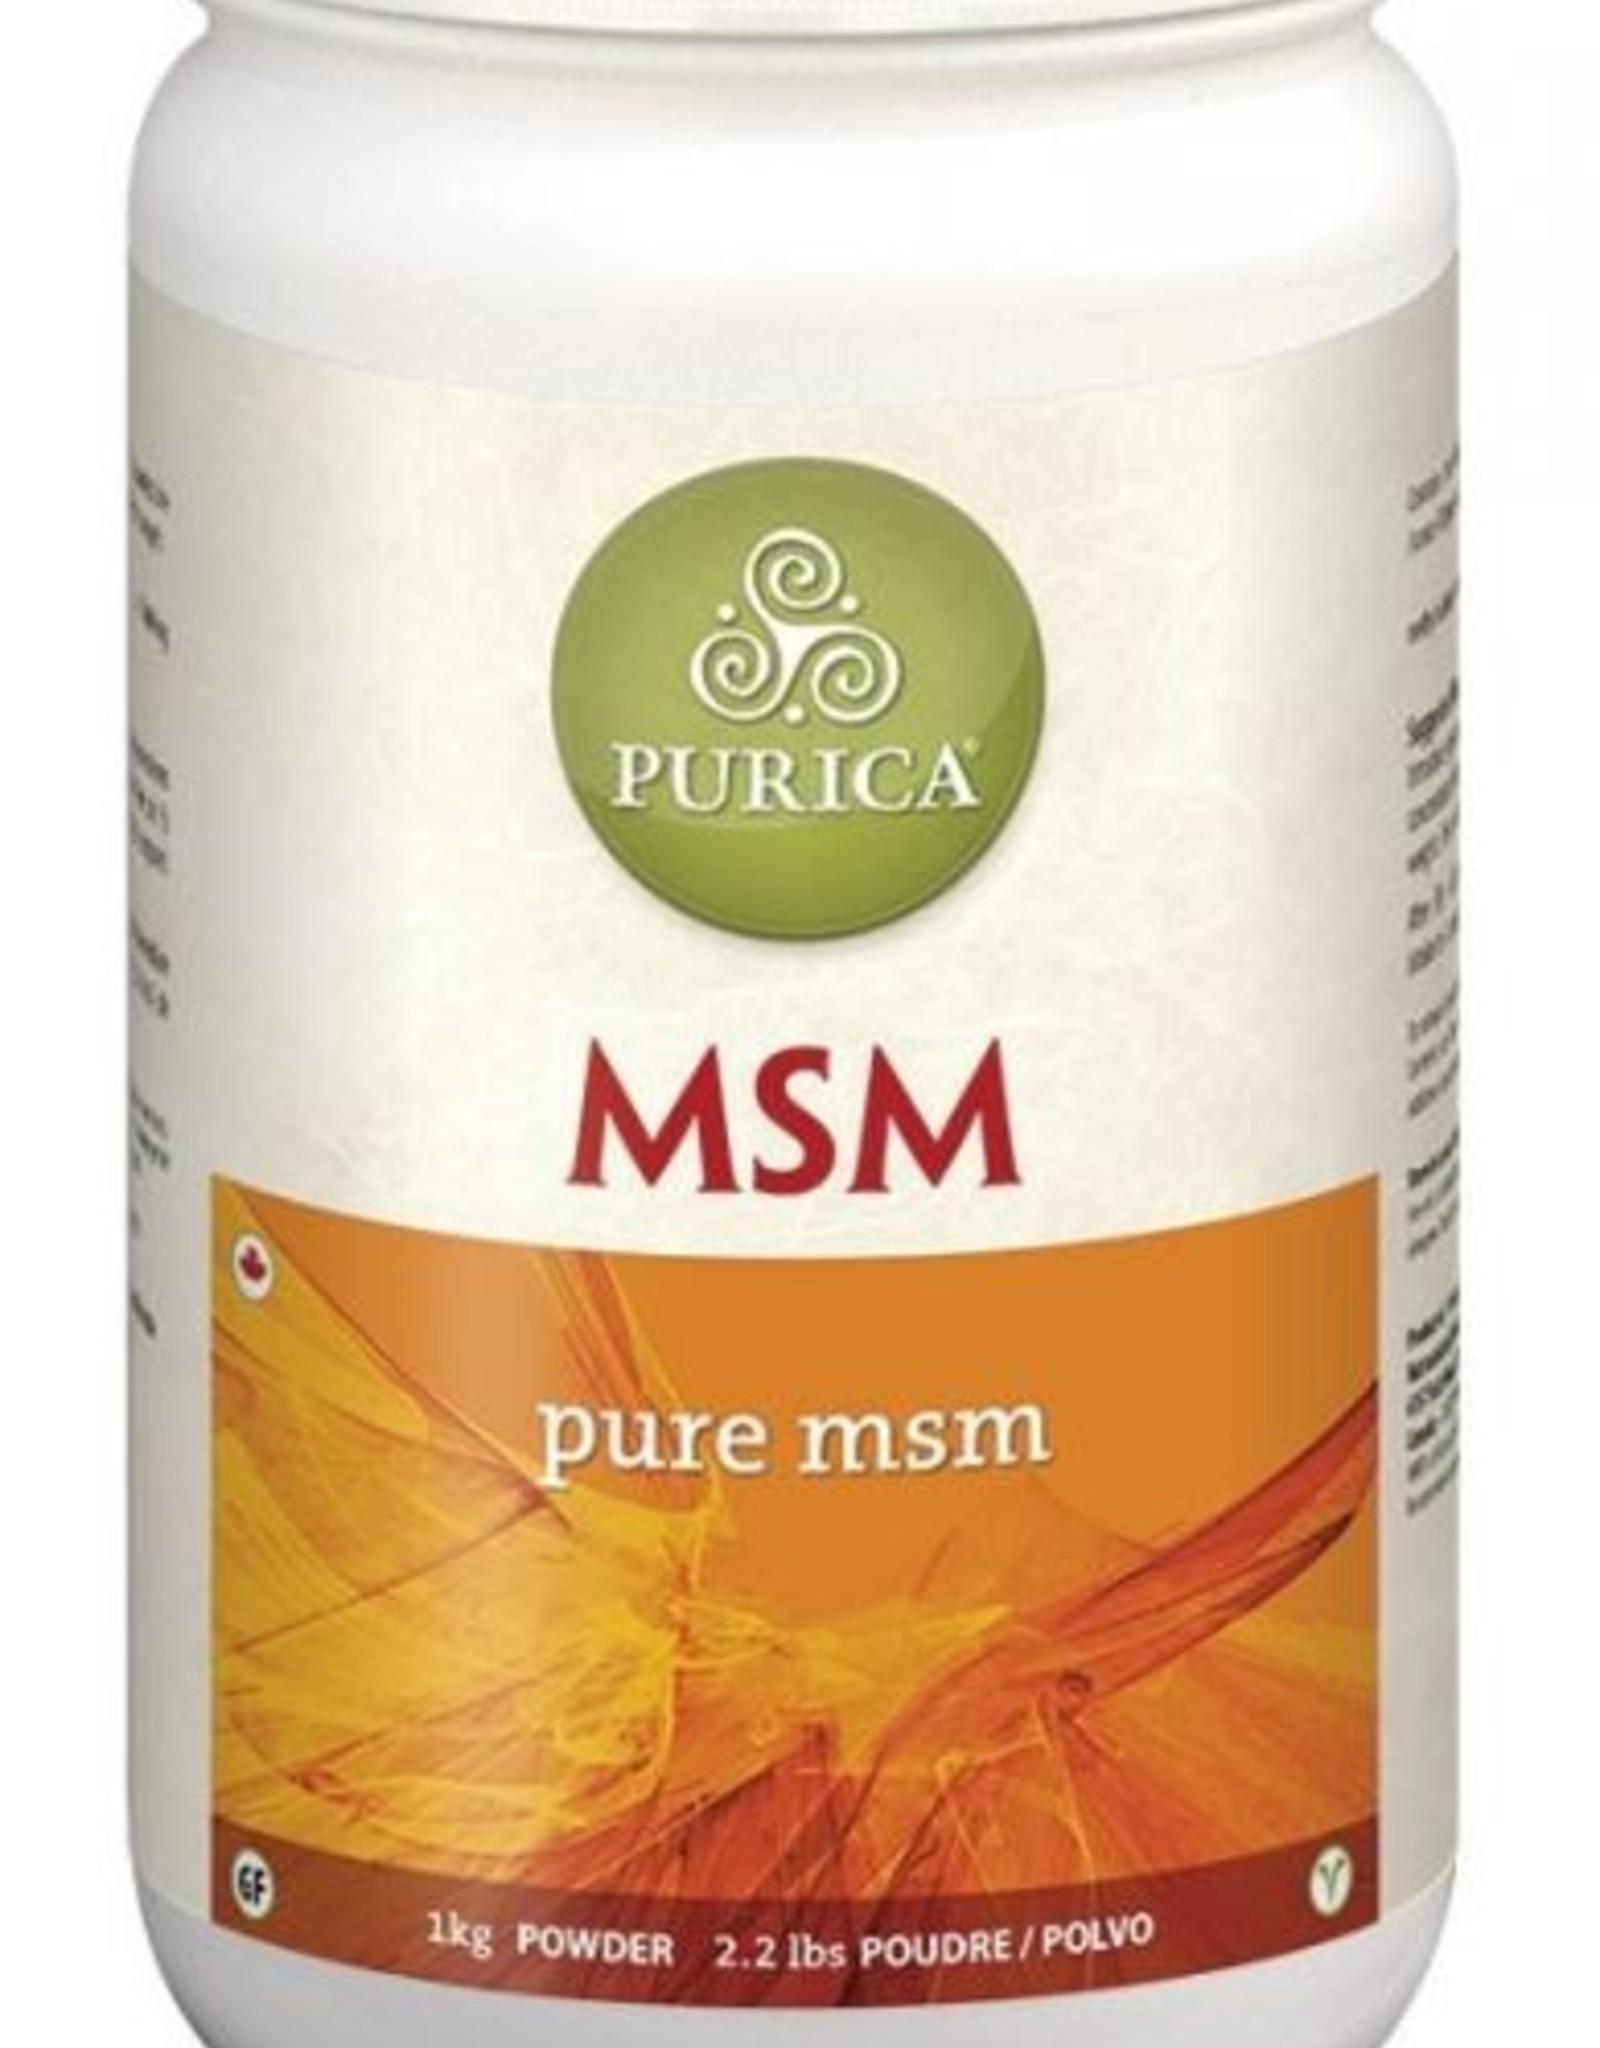 PURICA MSM 1KG